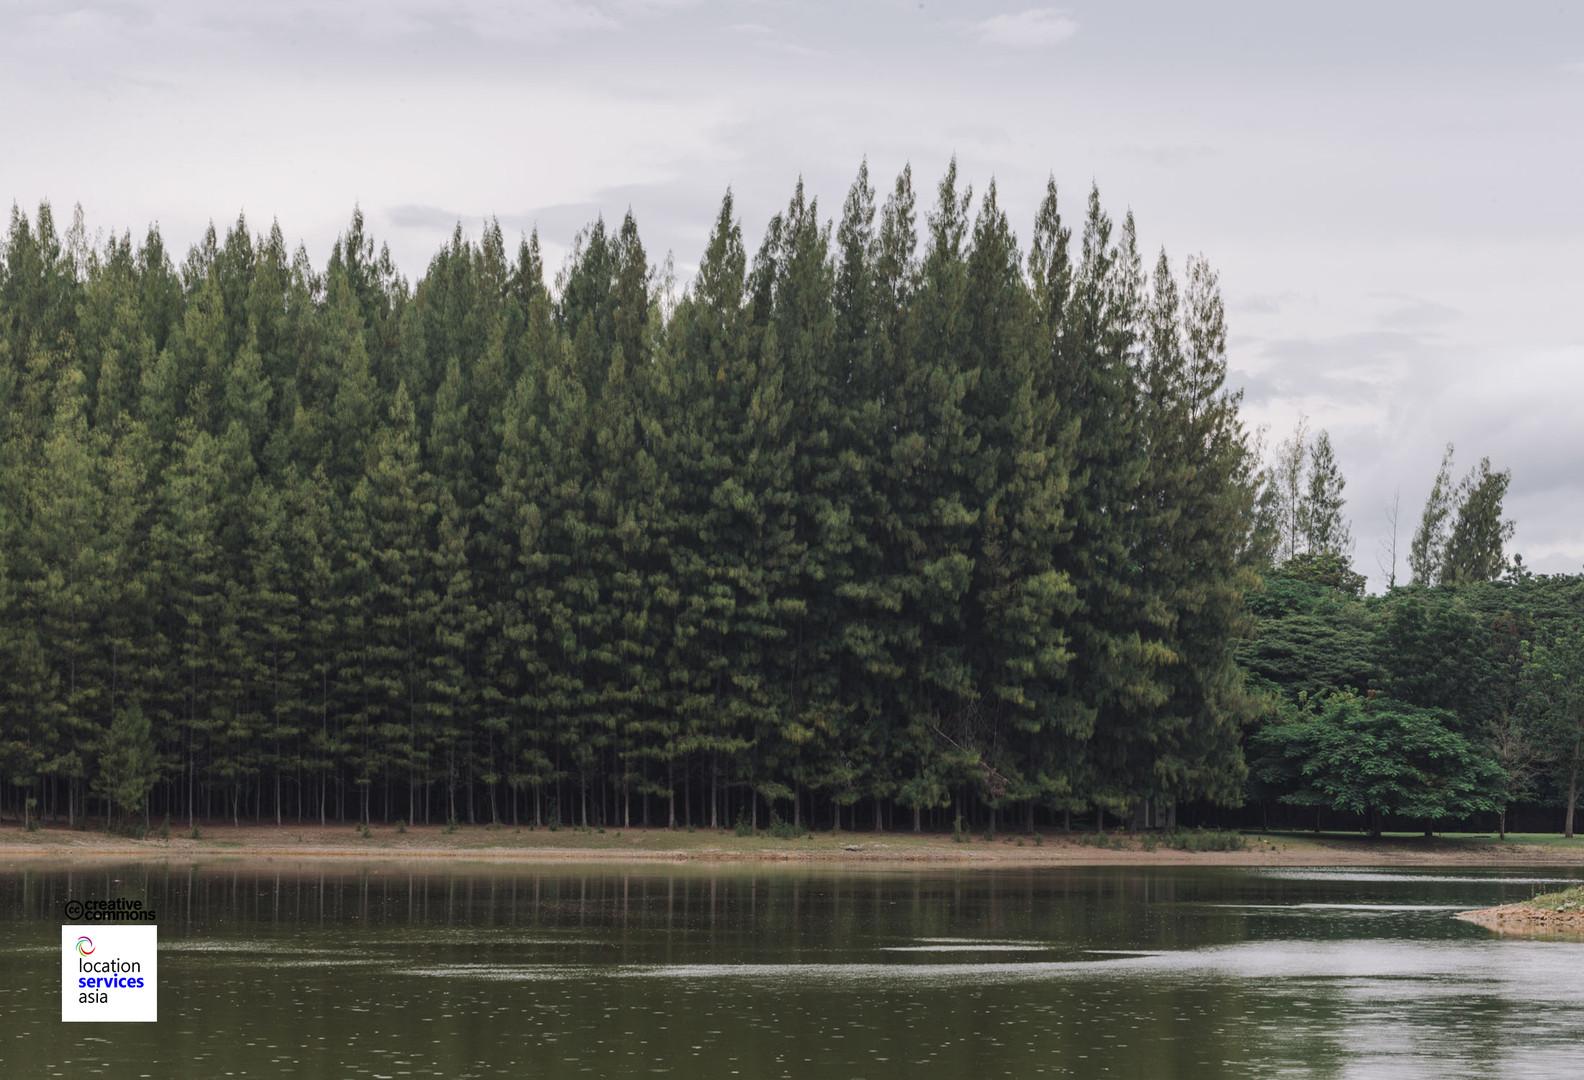 thai locations dams lakes c.jpg